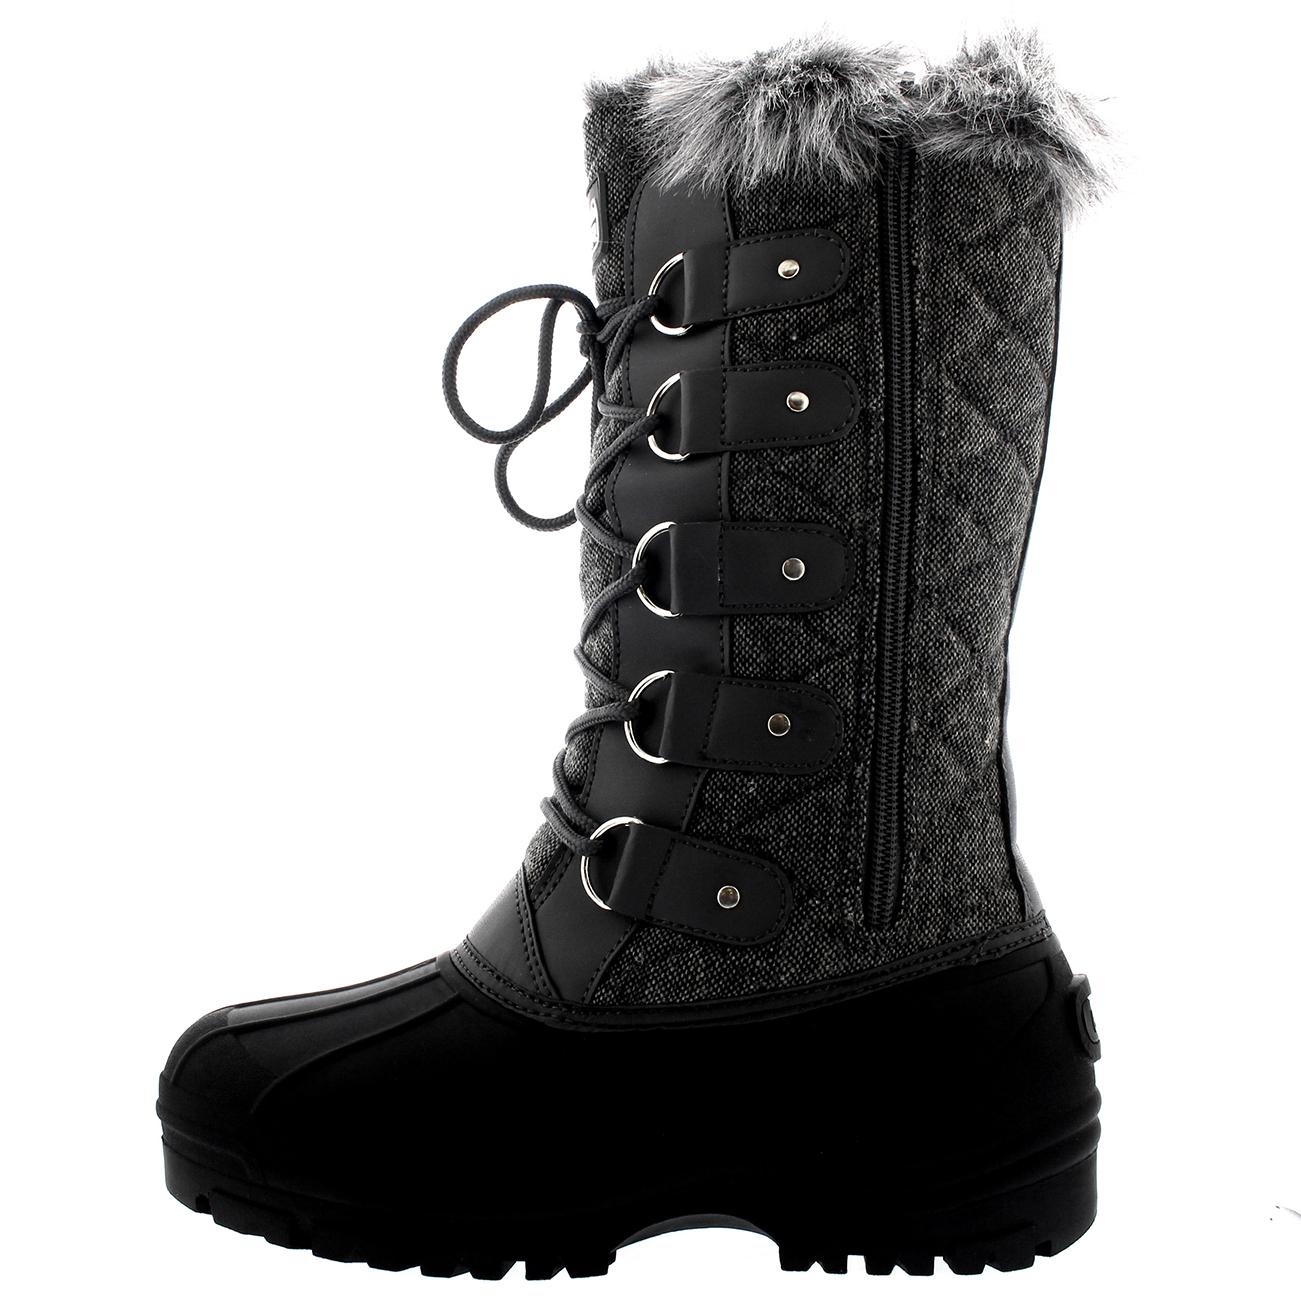 Womens Waterproof Tactical Mountain Walking Snow Fur Lined